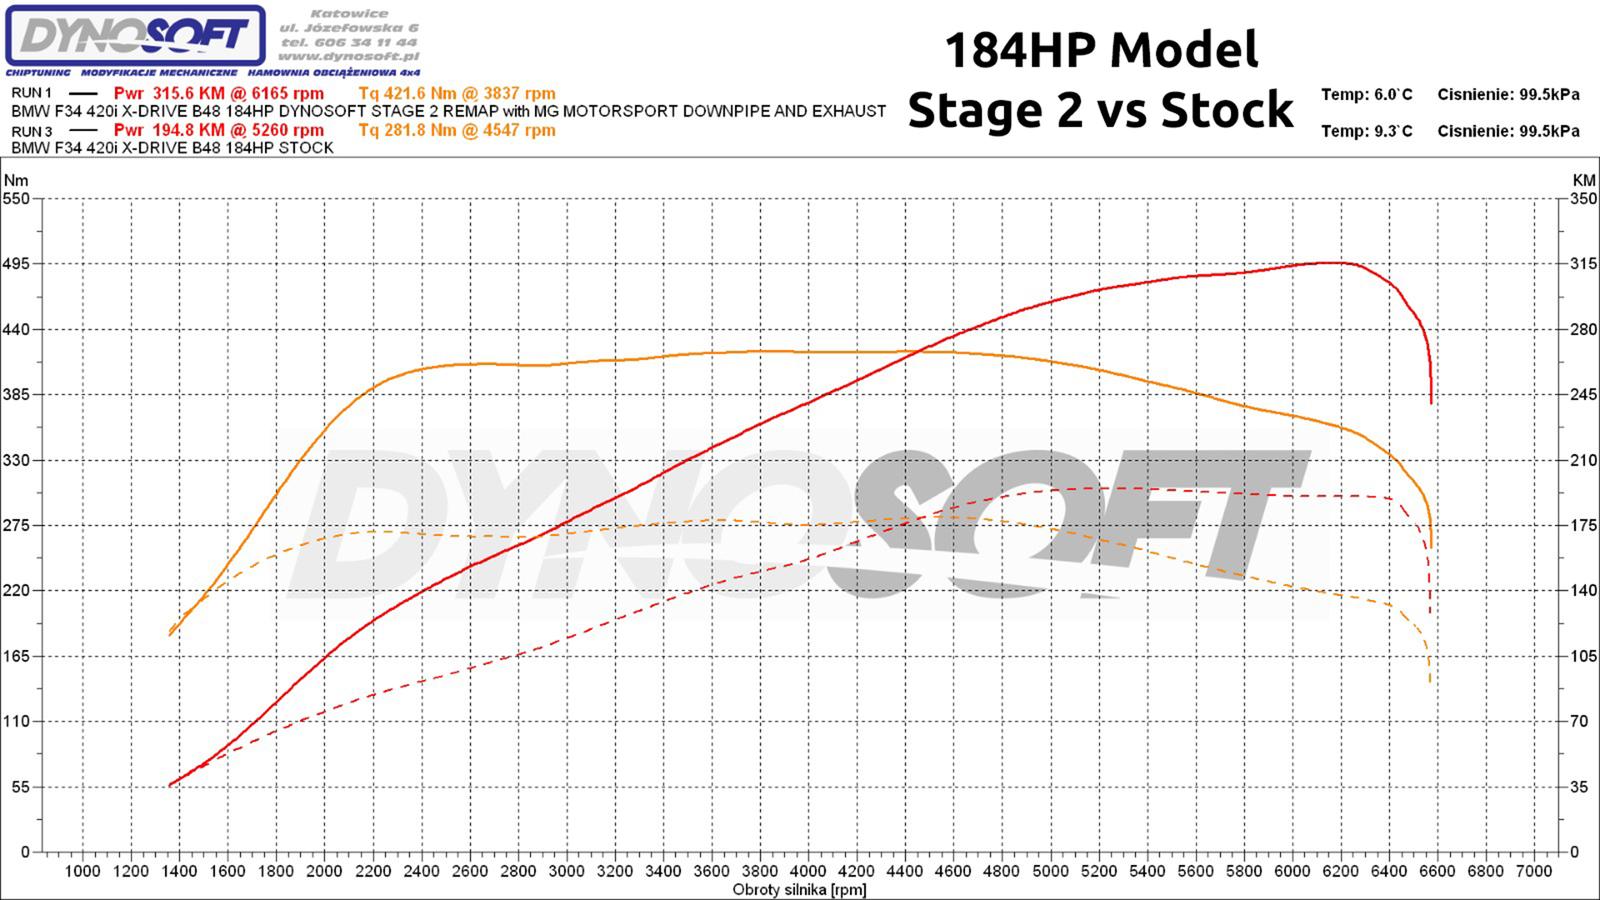 1-184hp st2 vs stock.png